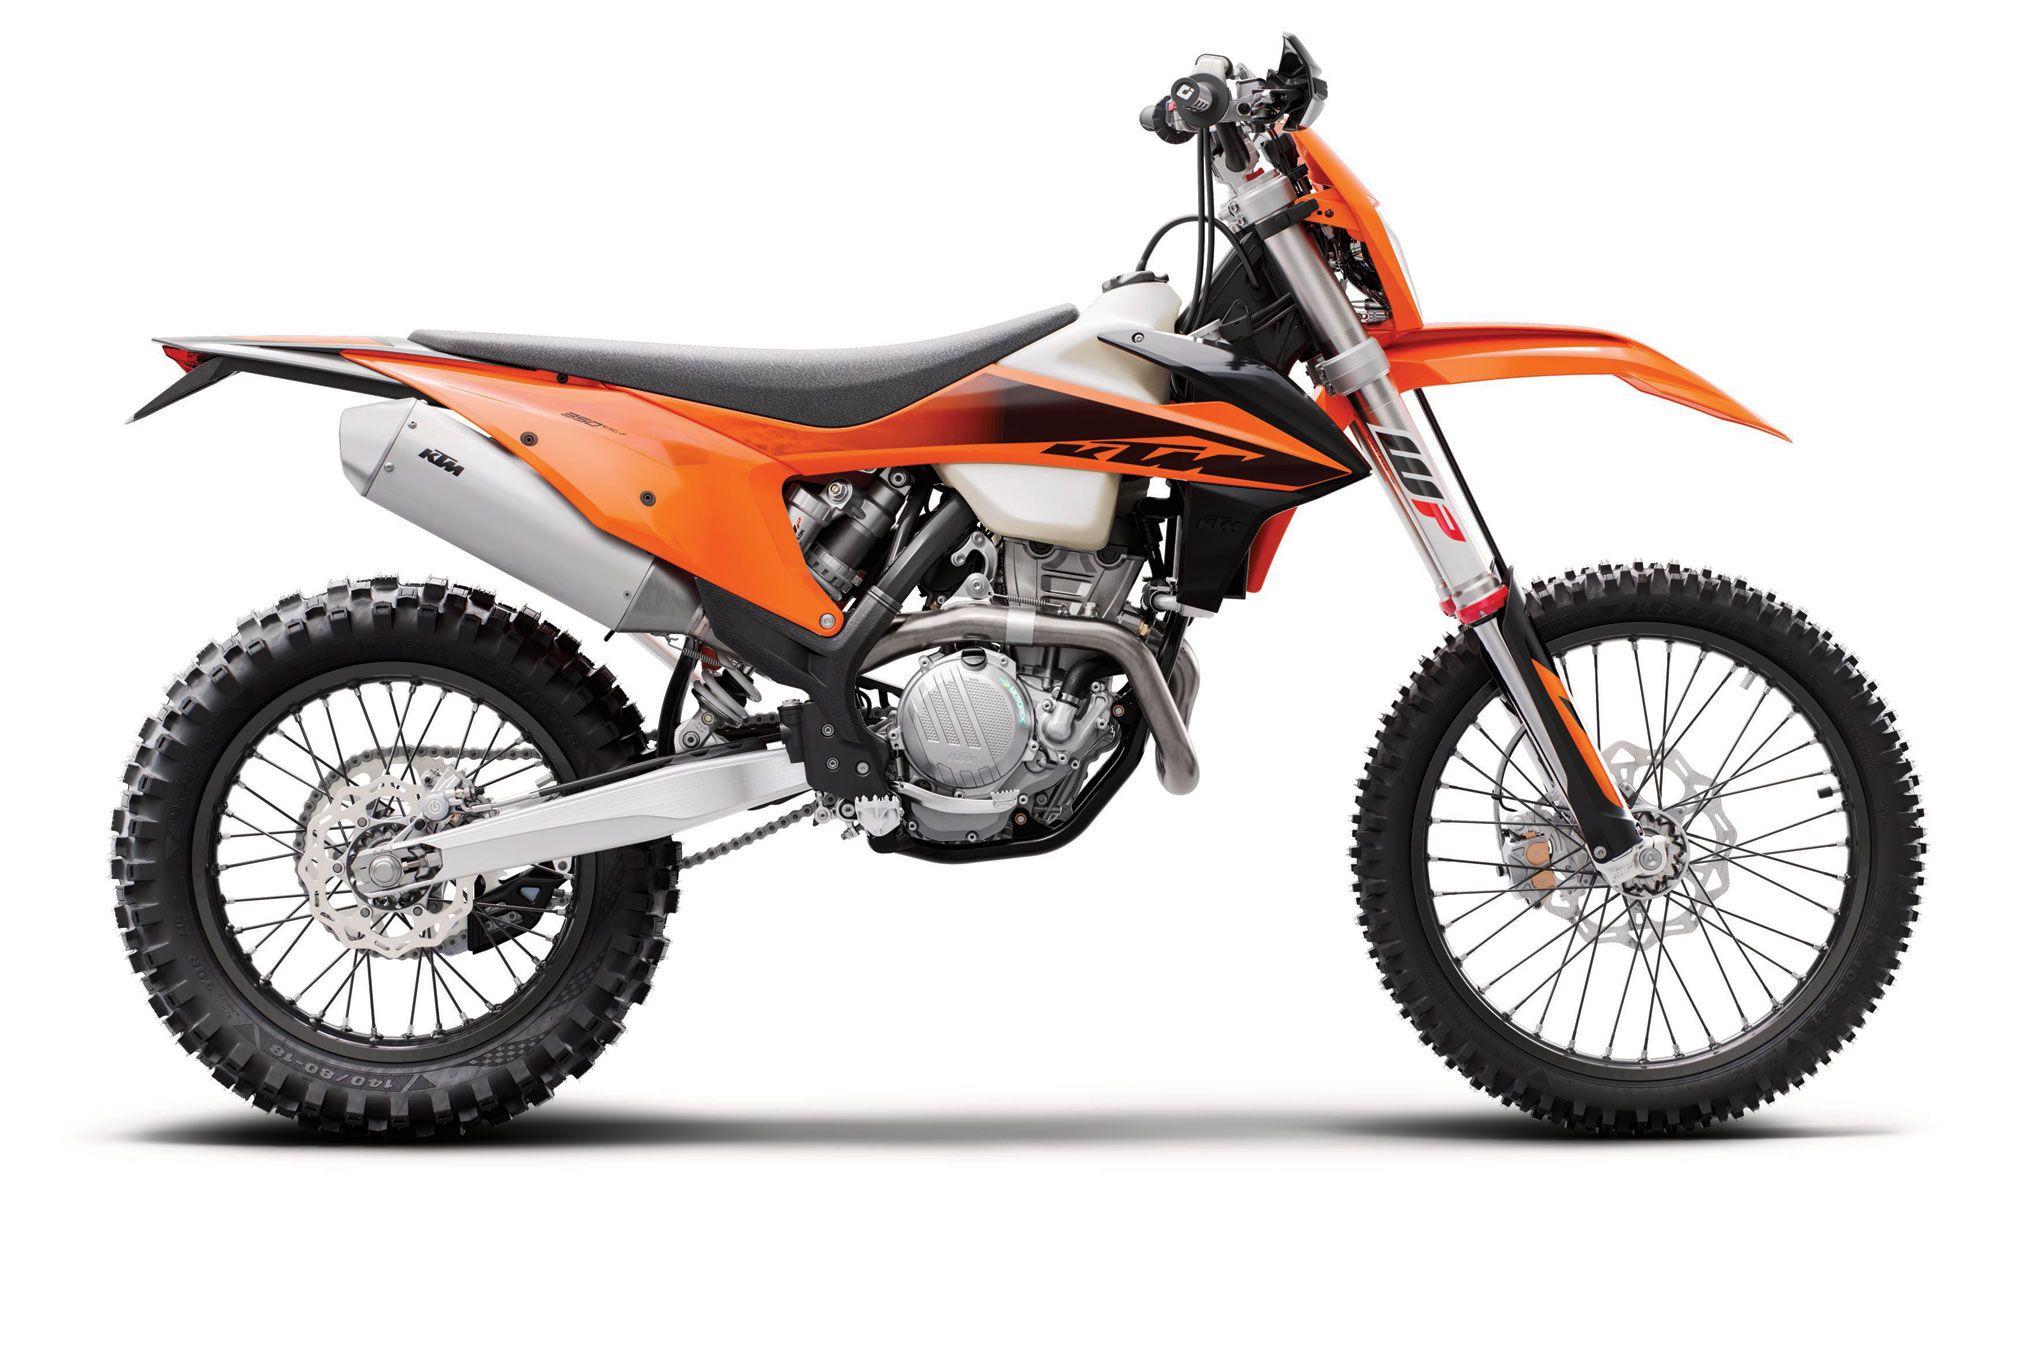 2020 Ktm 350 Exc F Guide Total Motorcycle Ktm Dirt Bikes Ktm Enduro Ktm